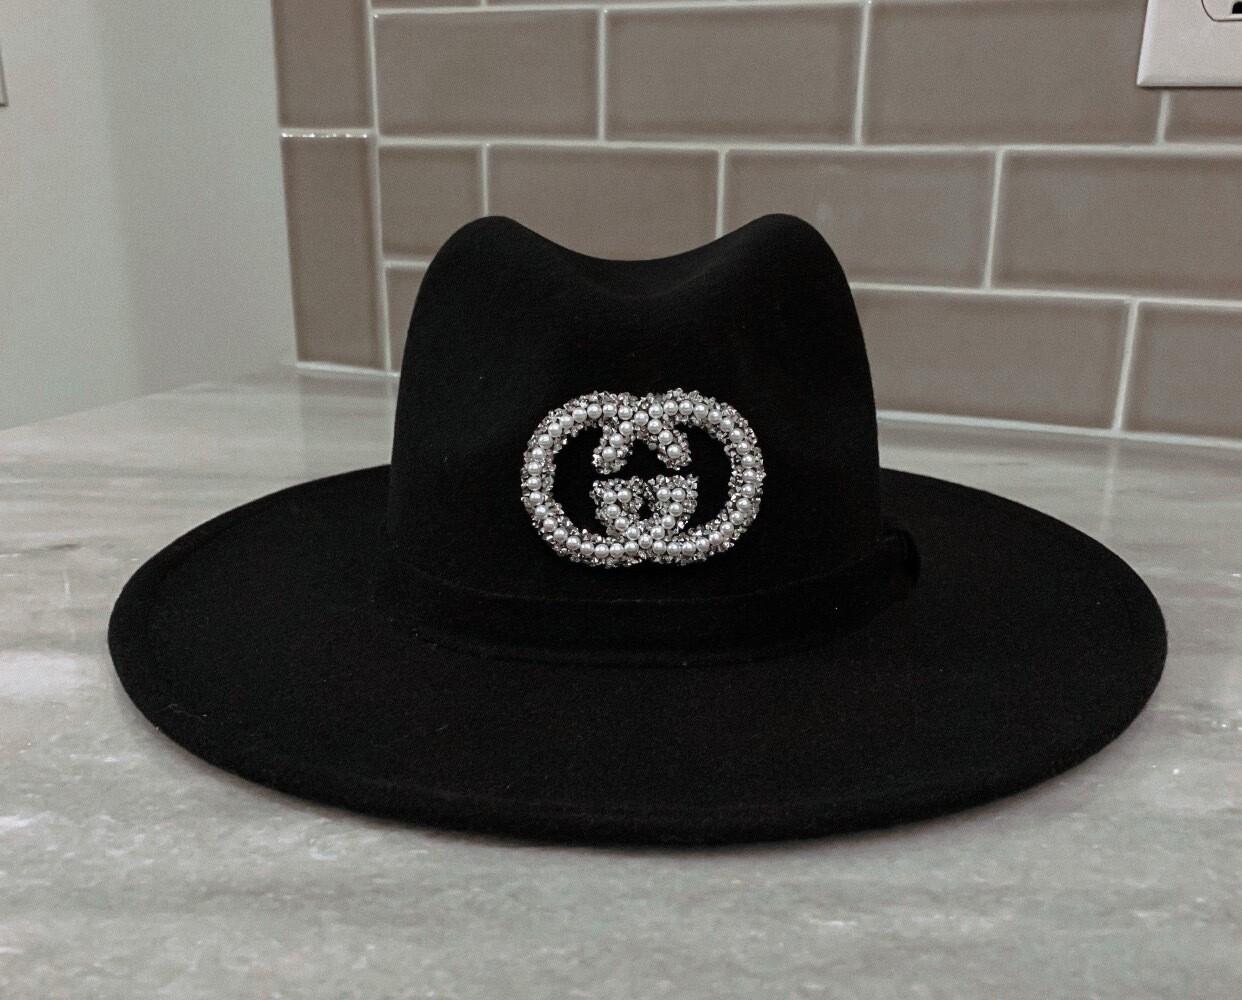 Authentic Gucci Black Glam Hat